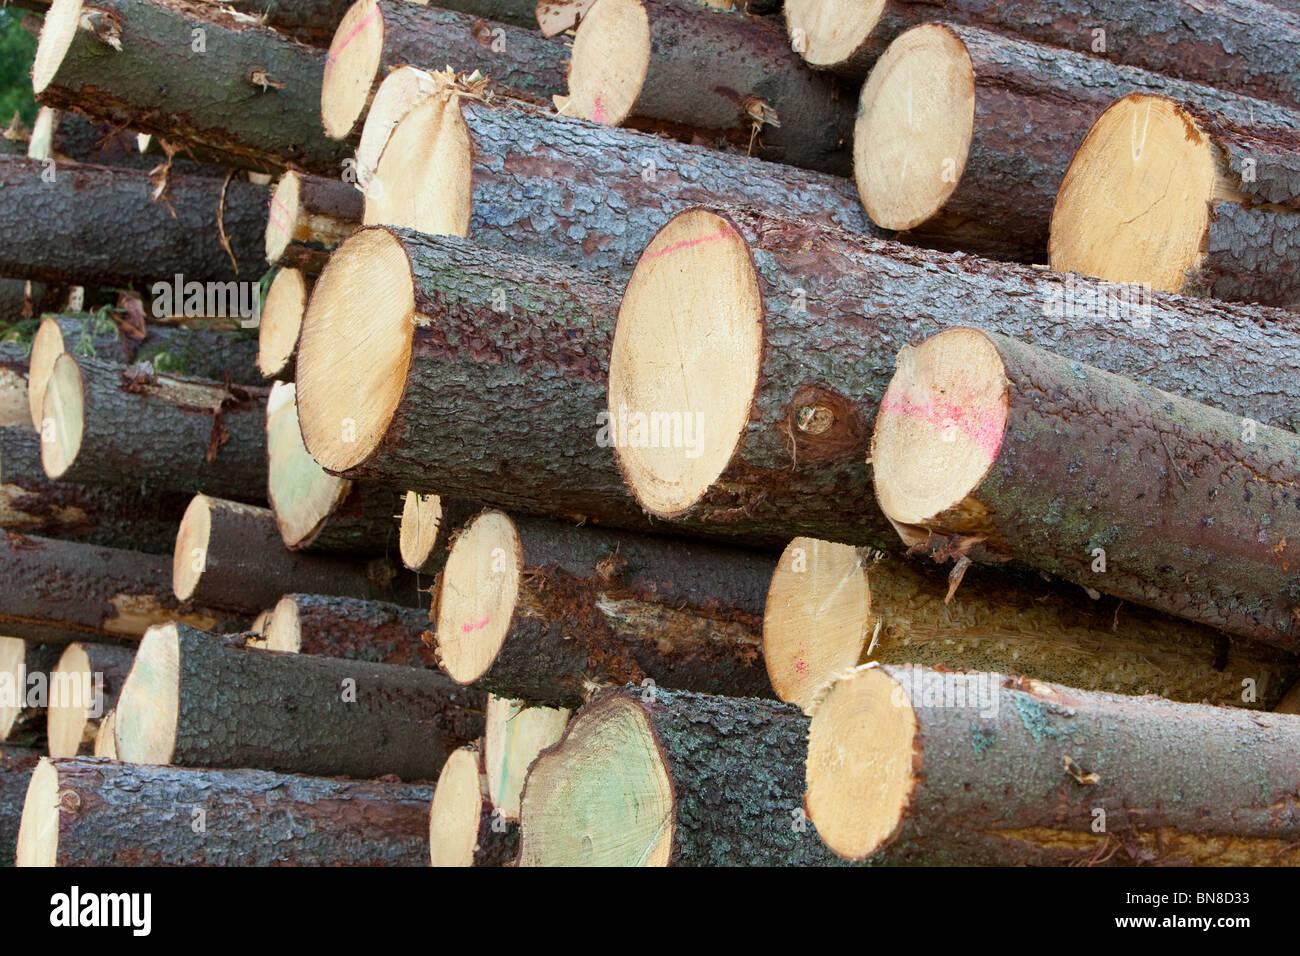 Spruce logs - Stock Image